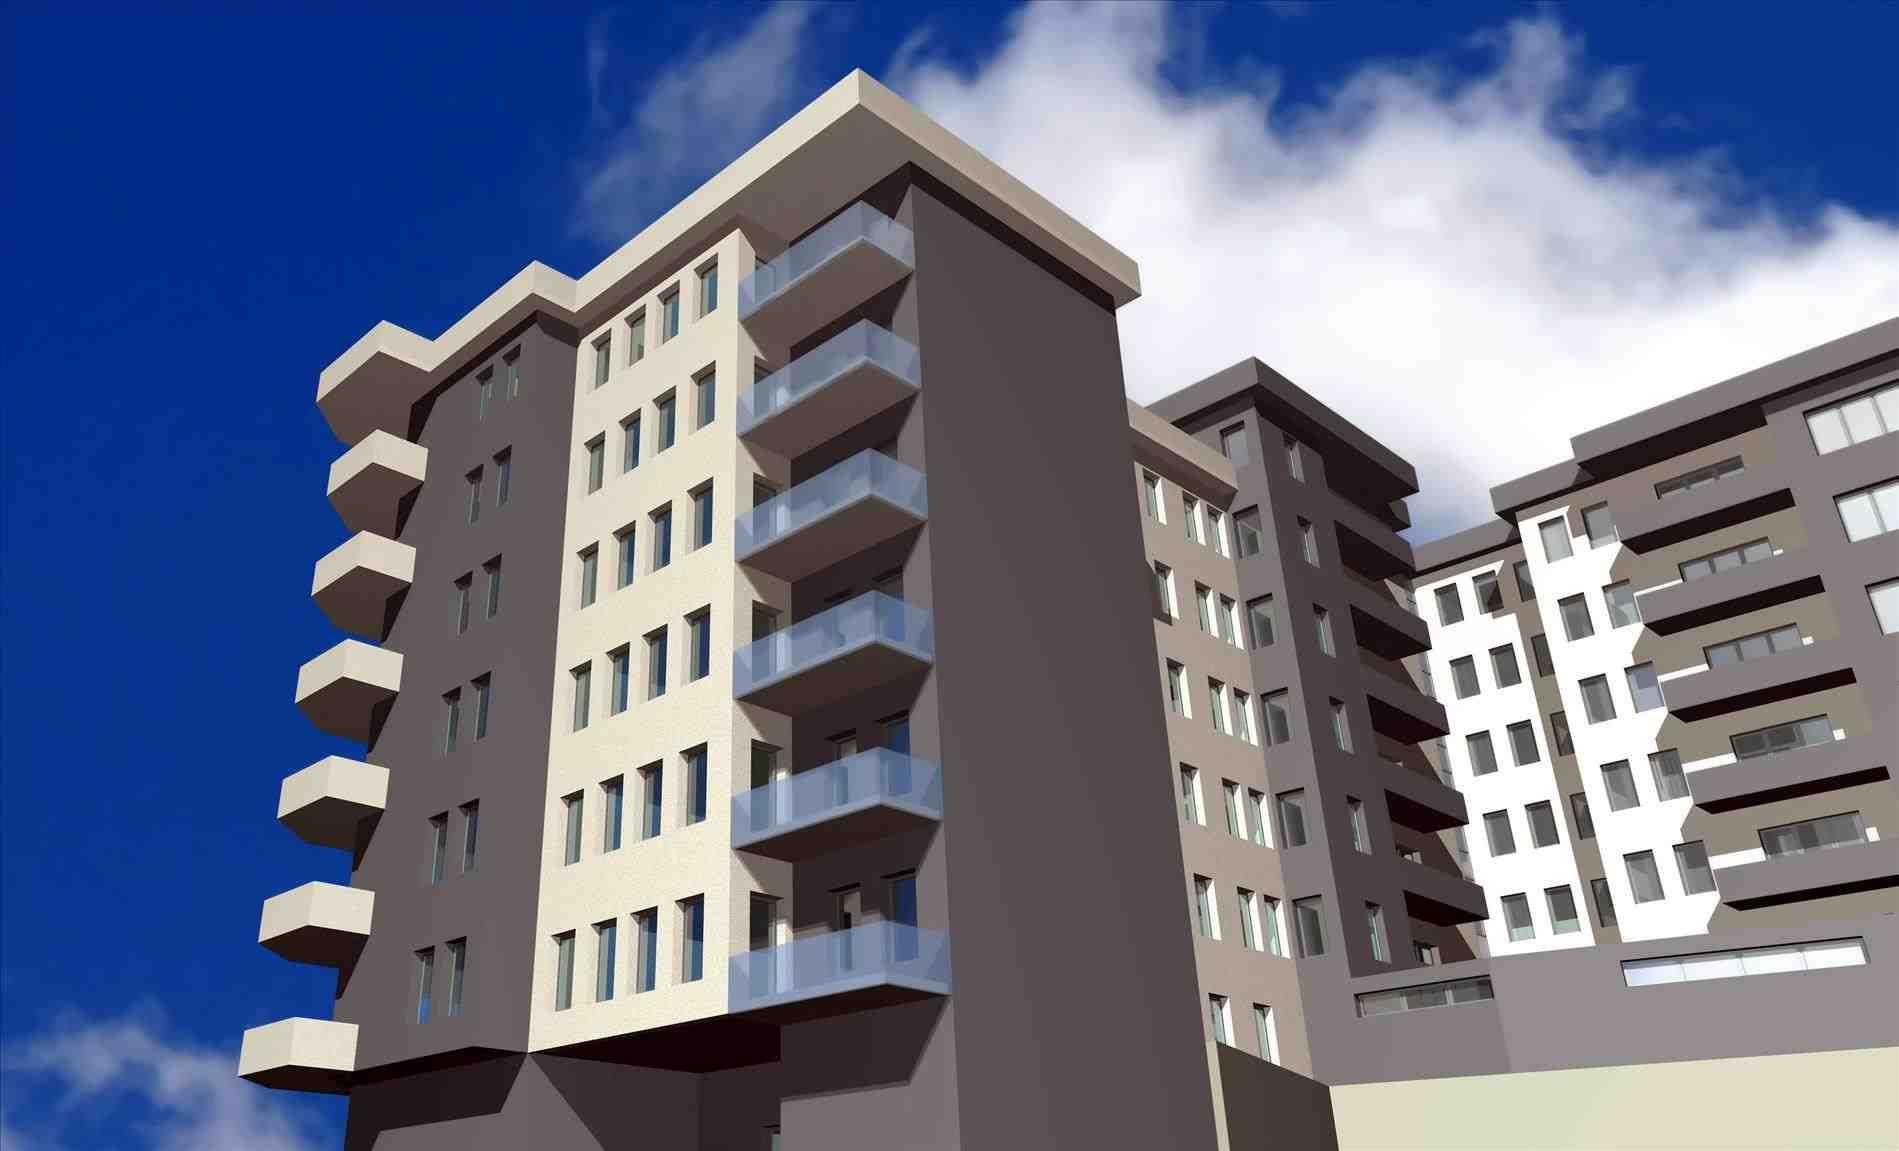 Apartment tetris | House elevation, Cool apartments, Front ...